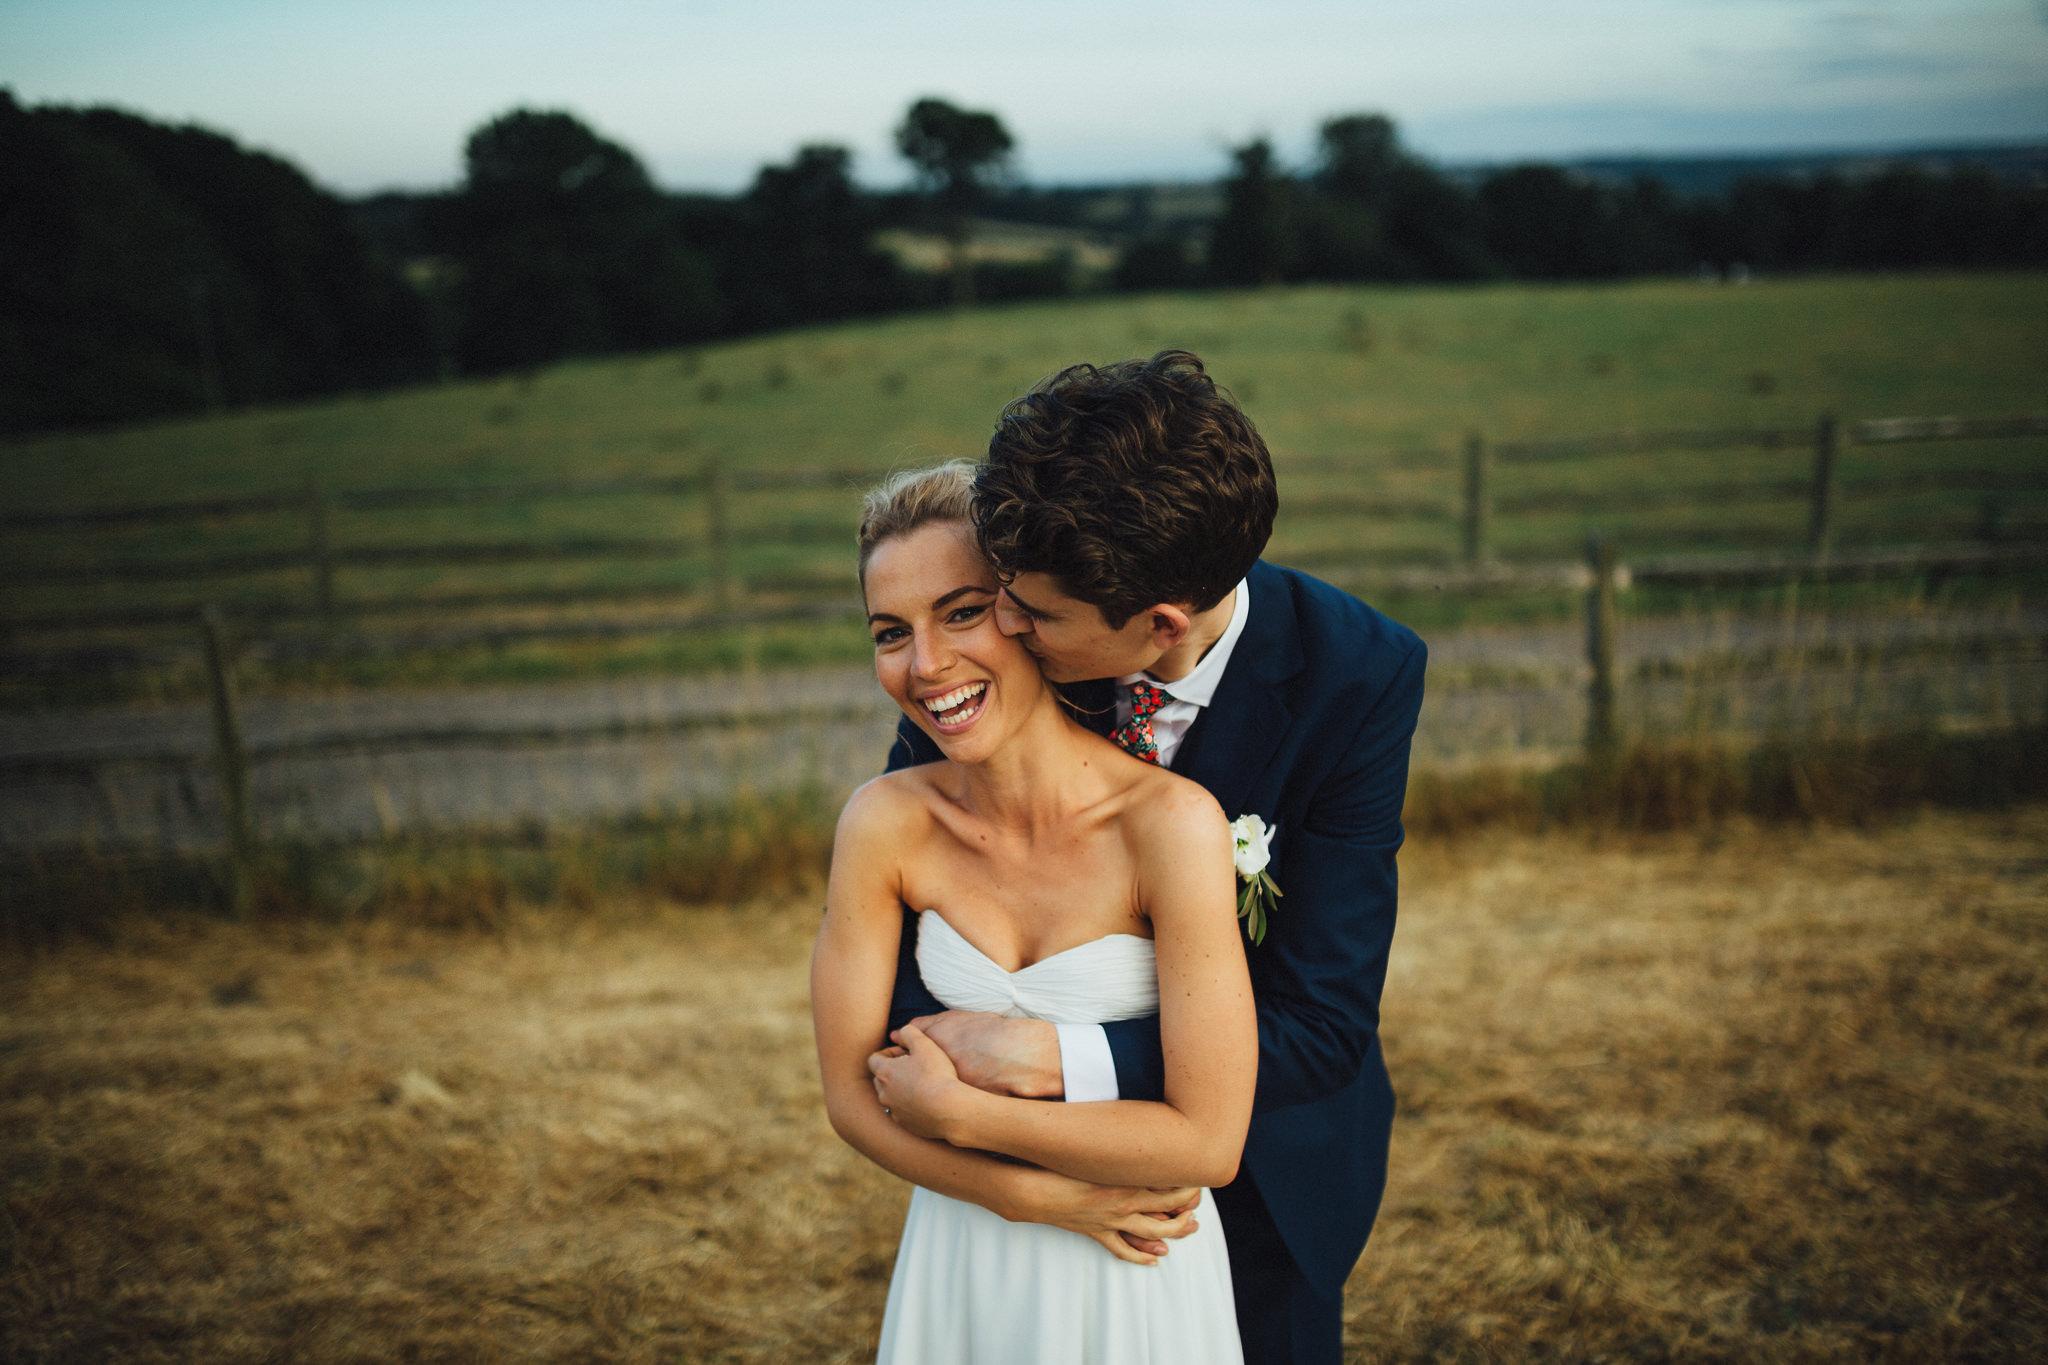 paul-marbrook-Gaynes-Park Wedding-Photographer-90134